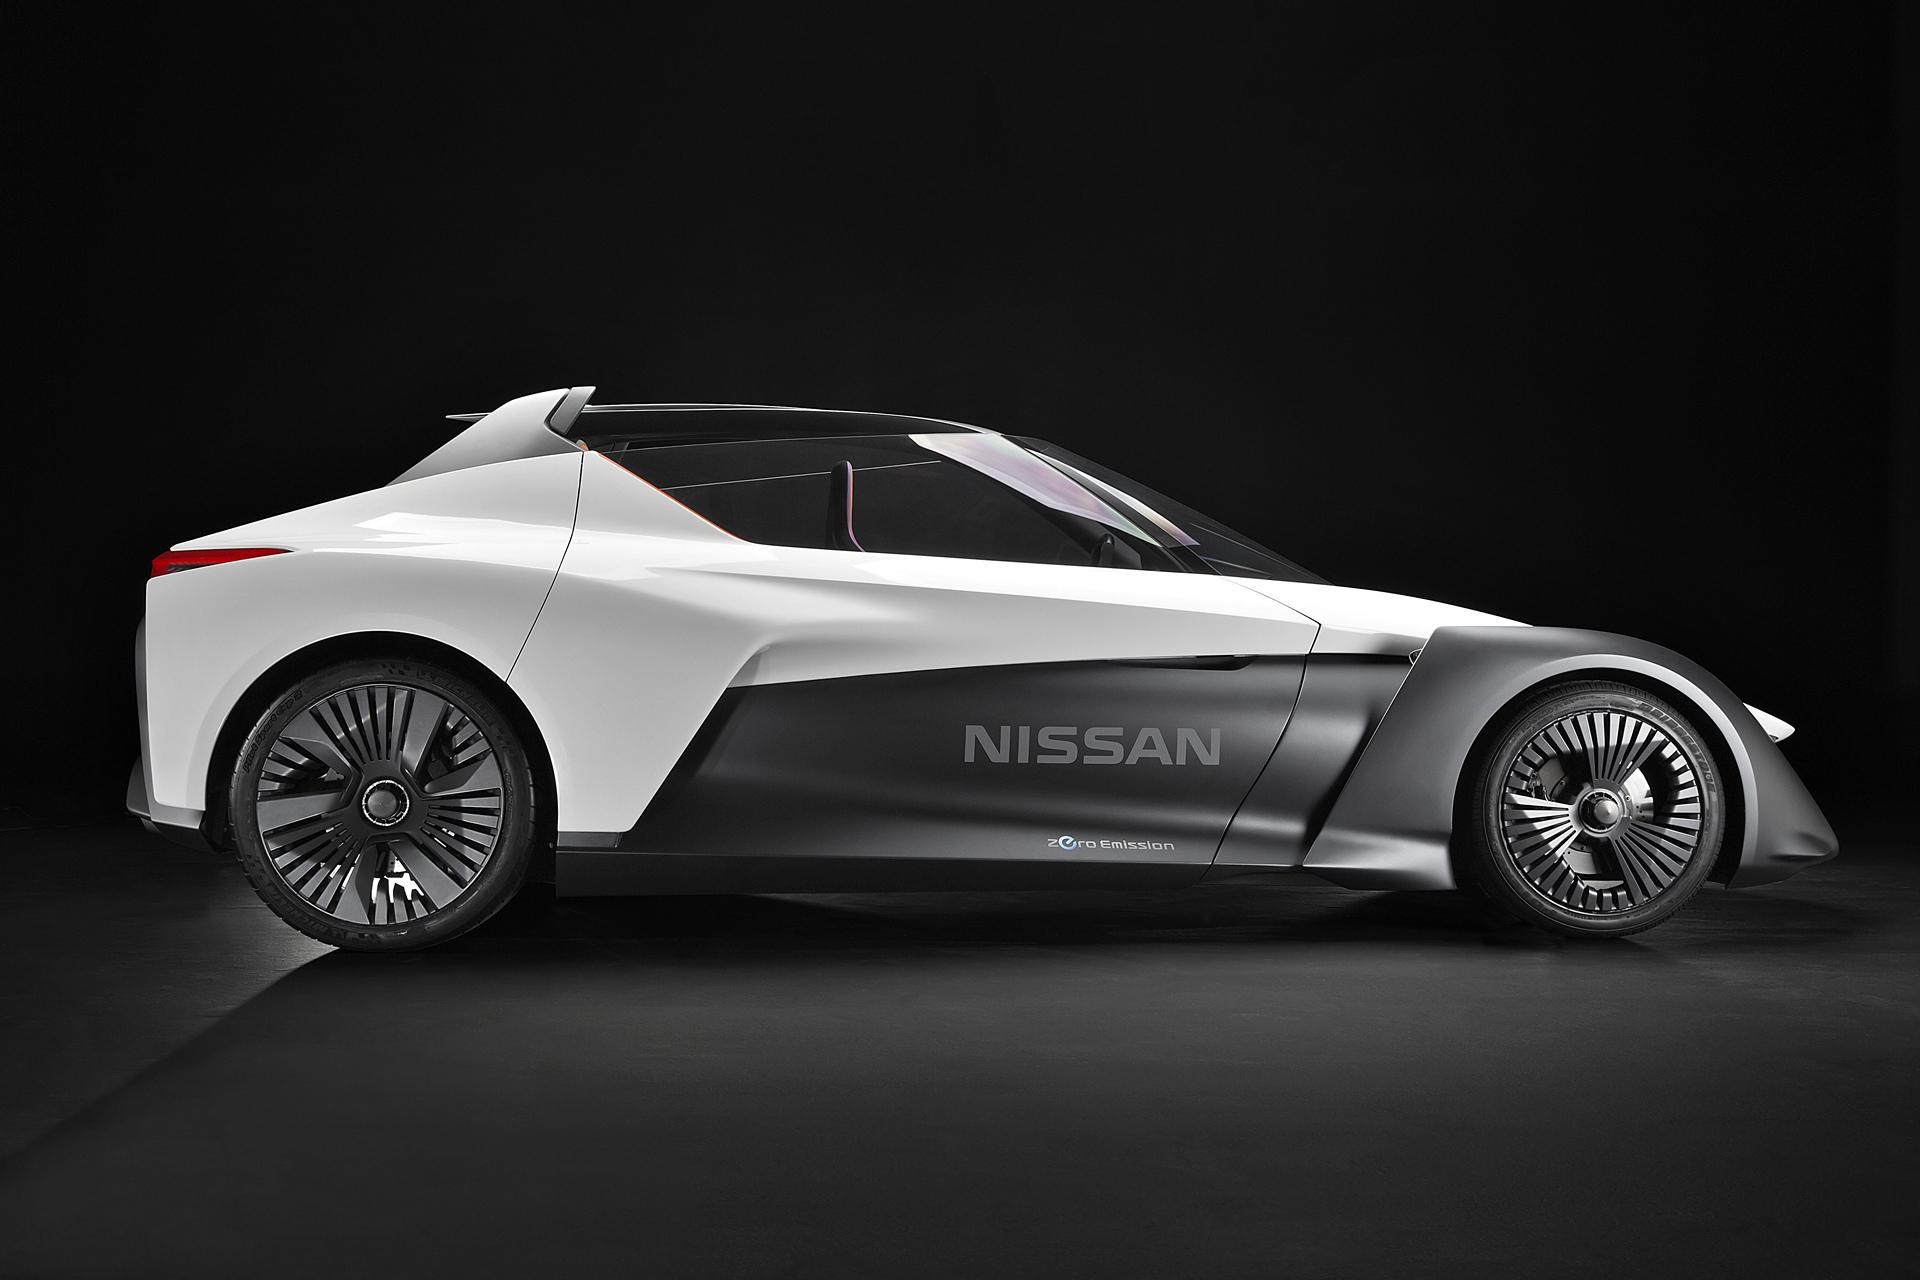 Nissan BladeGlider © Nissan Motor Co., Ltd.